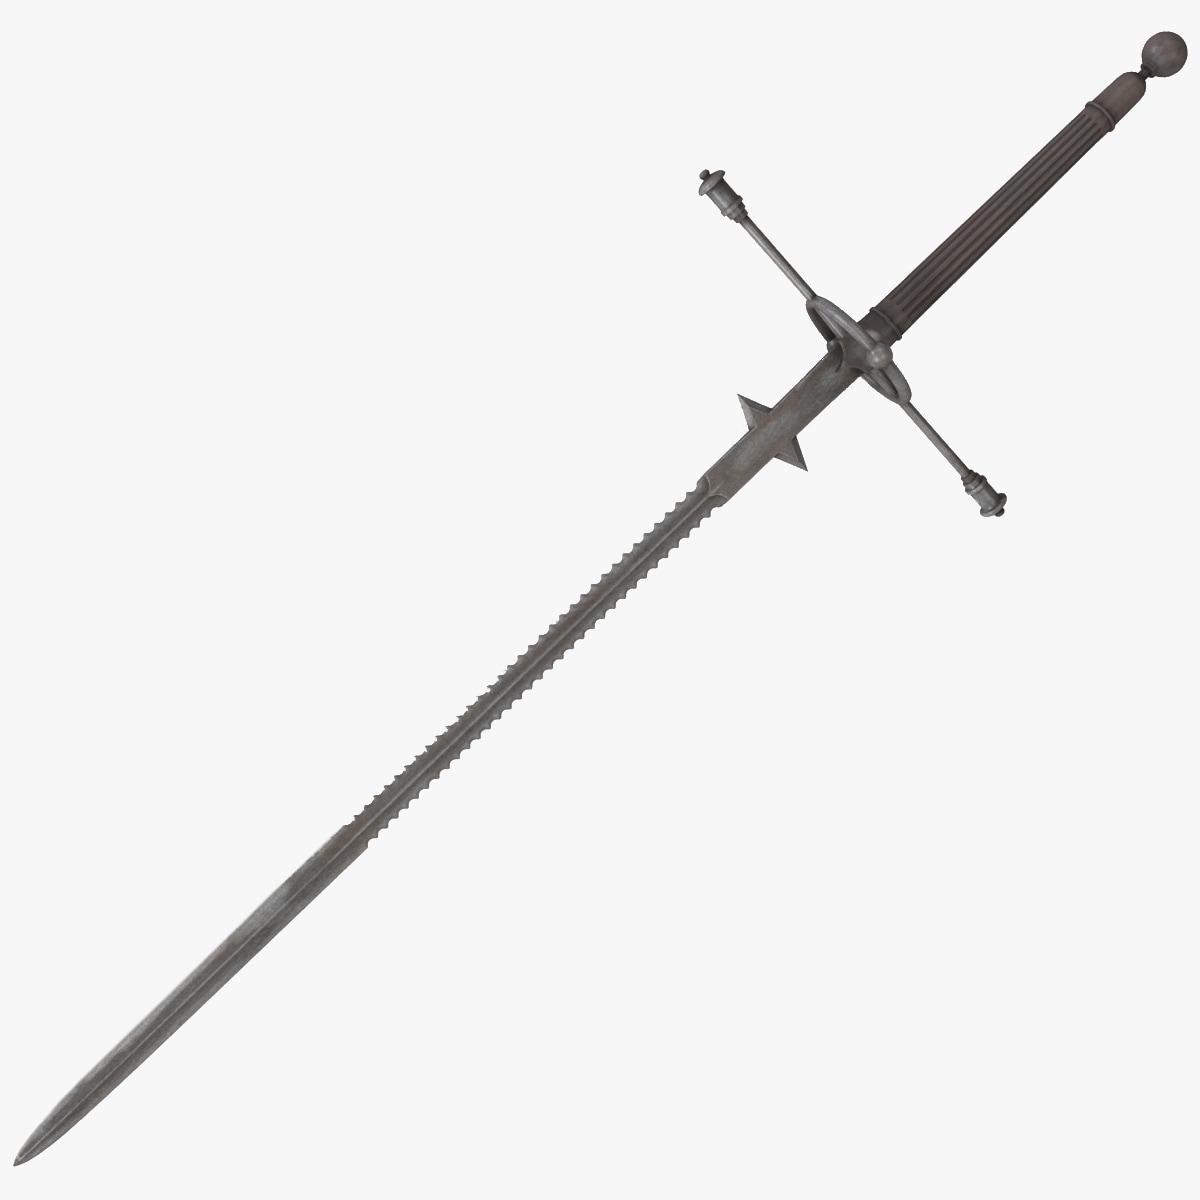 max zweihander sword Zweihander